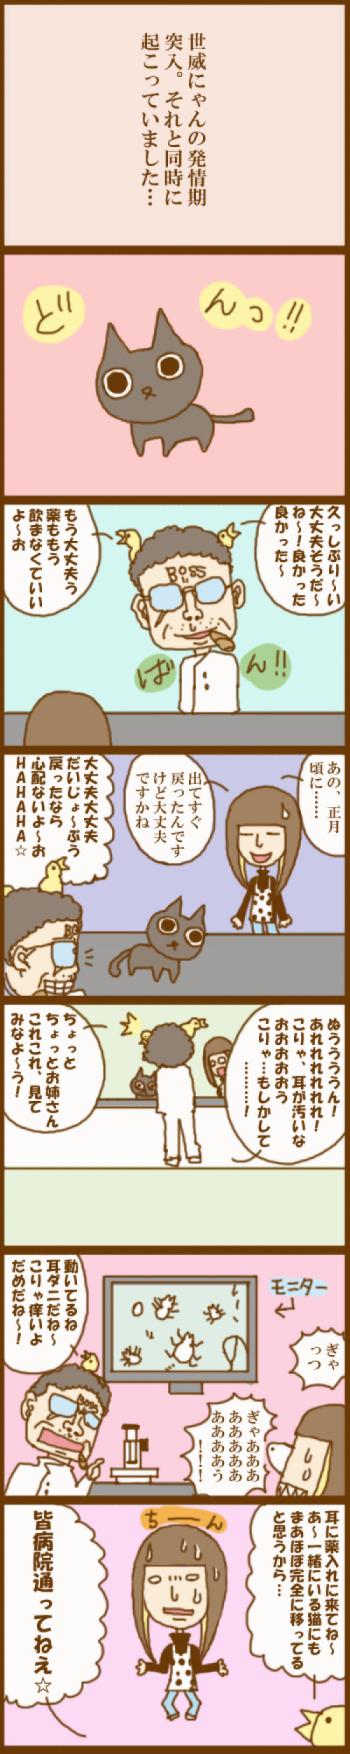 f:id:suzuokayu:20201115185642j:plain